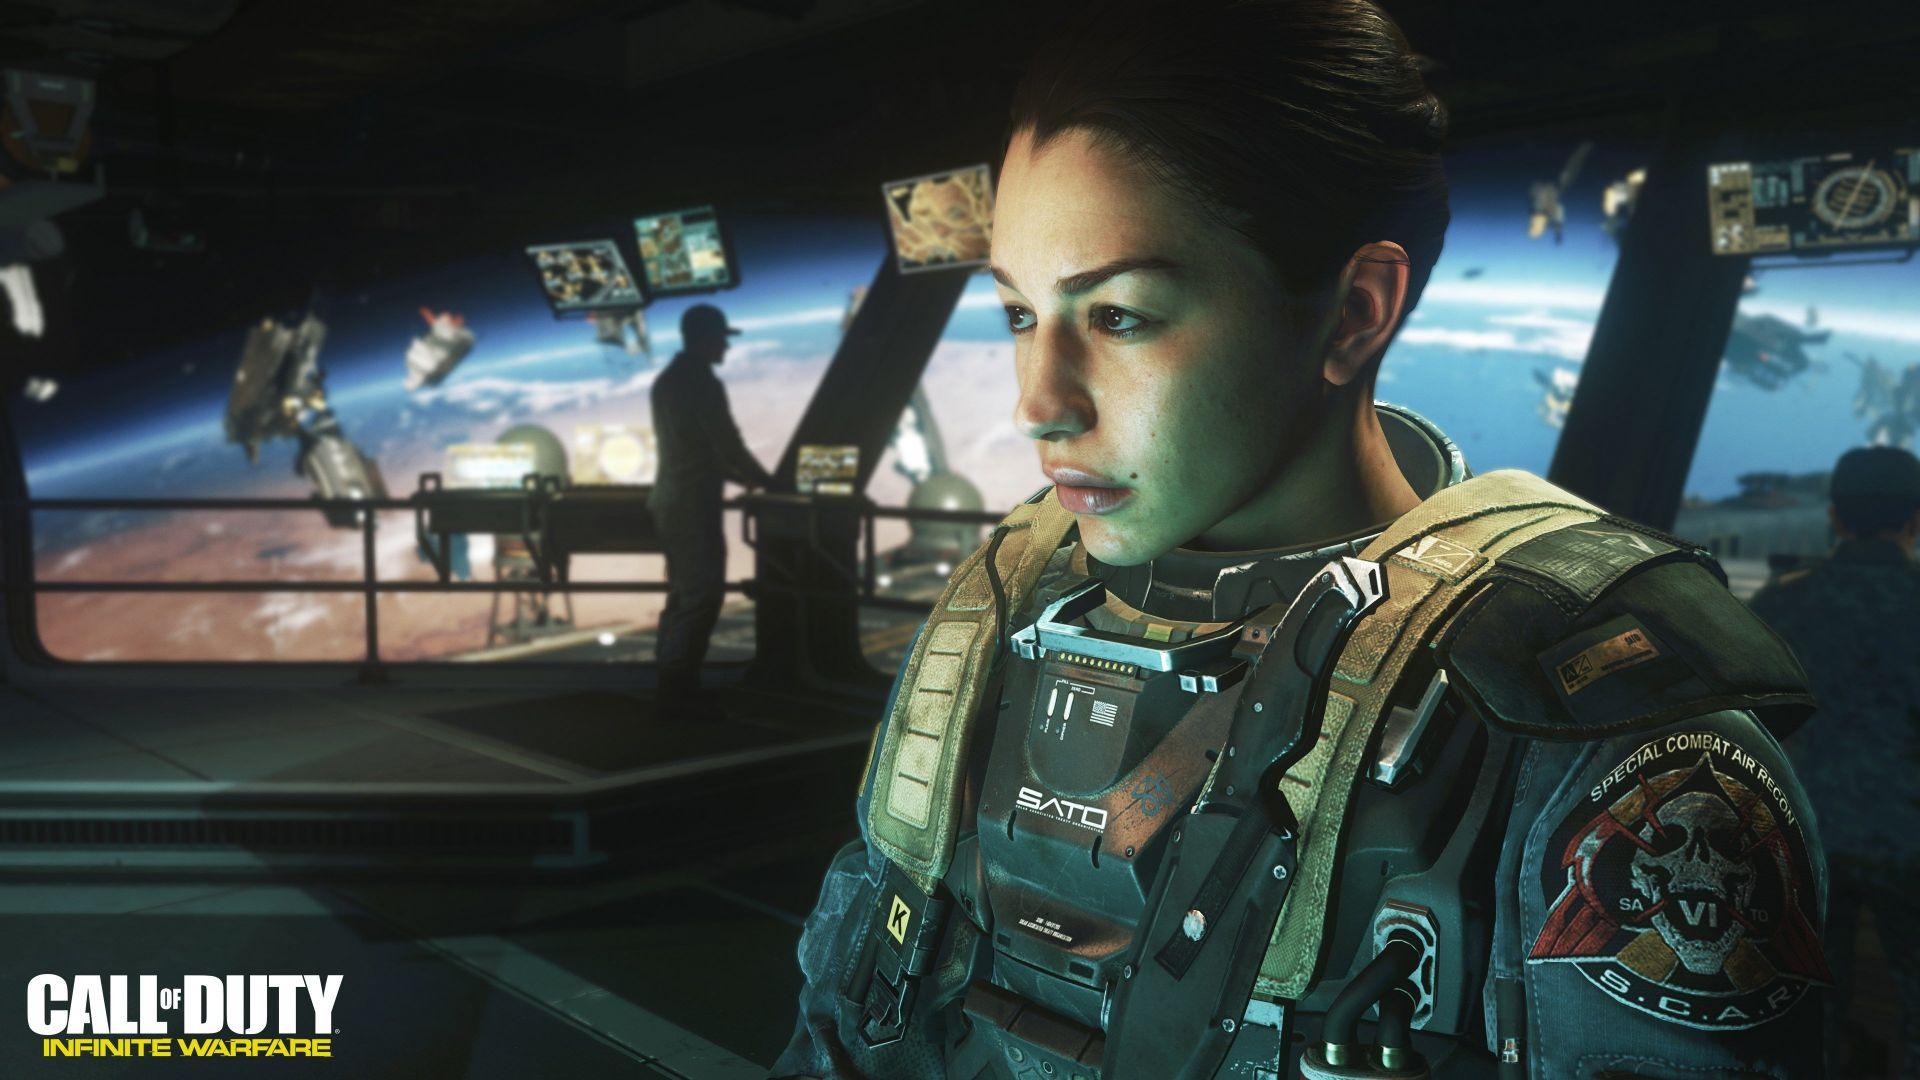 Wallpaper Call Of Duty Infinite Warfare Shooter Pc Ps 4 Xbox